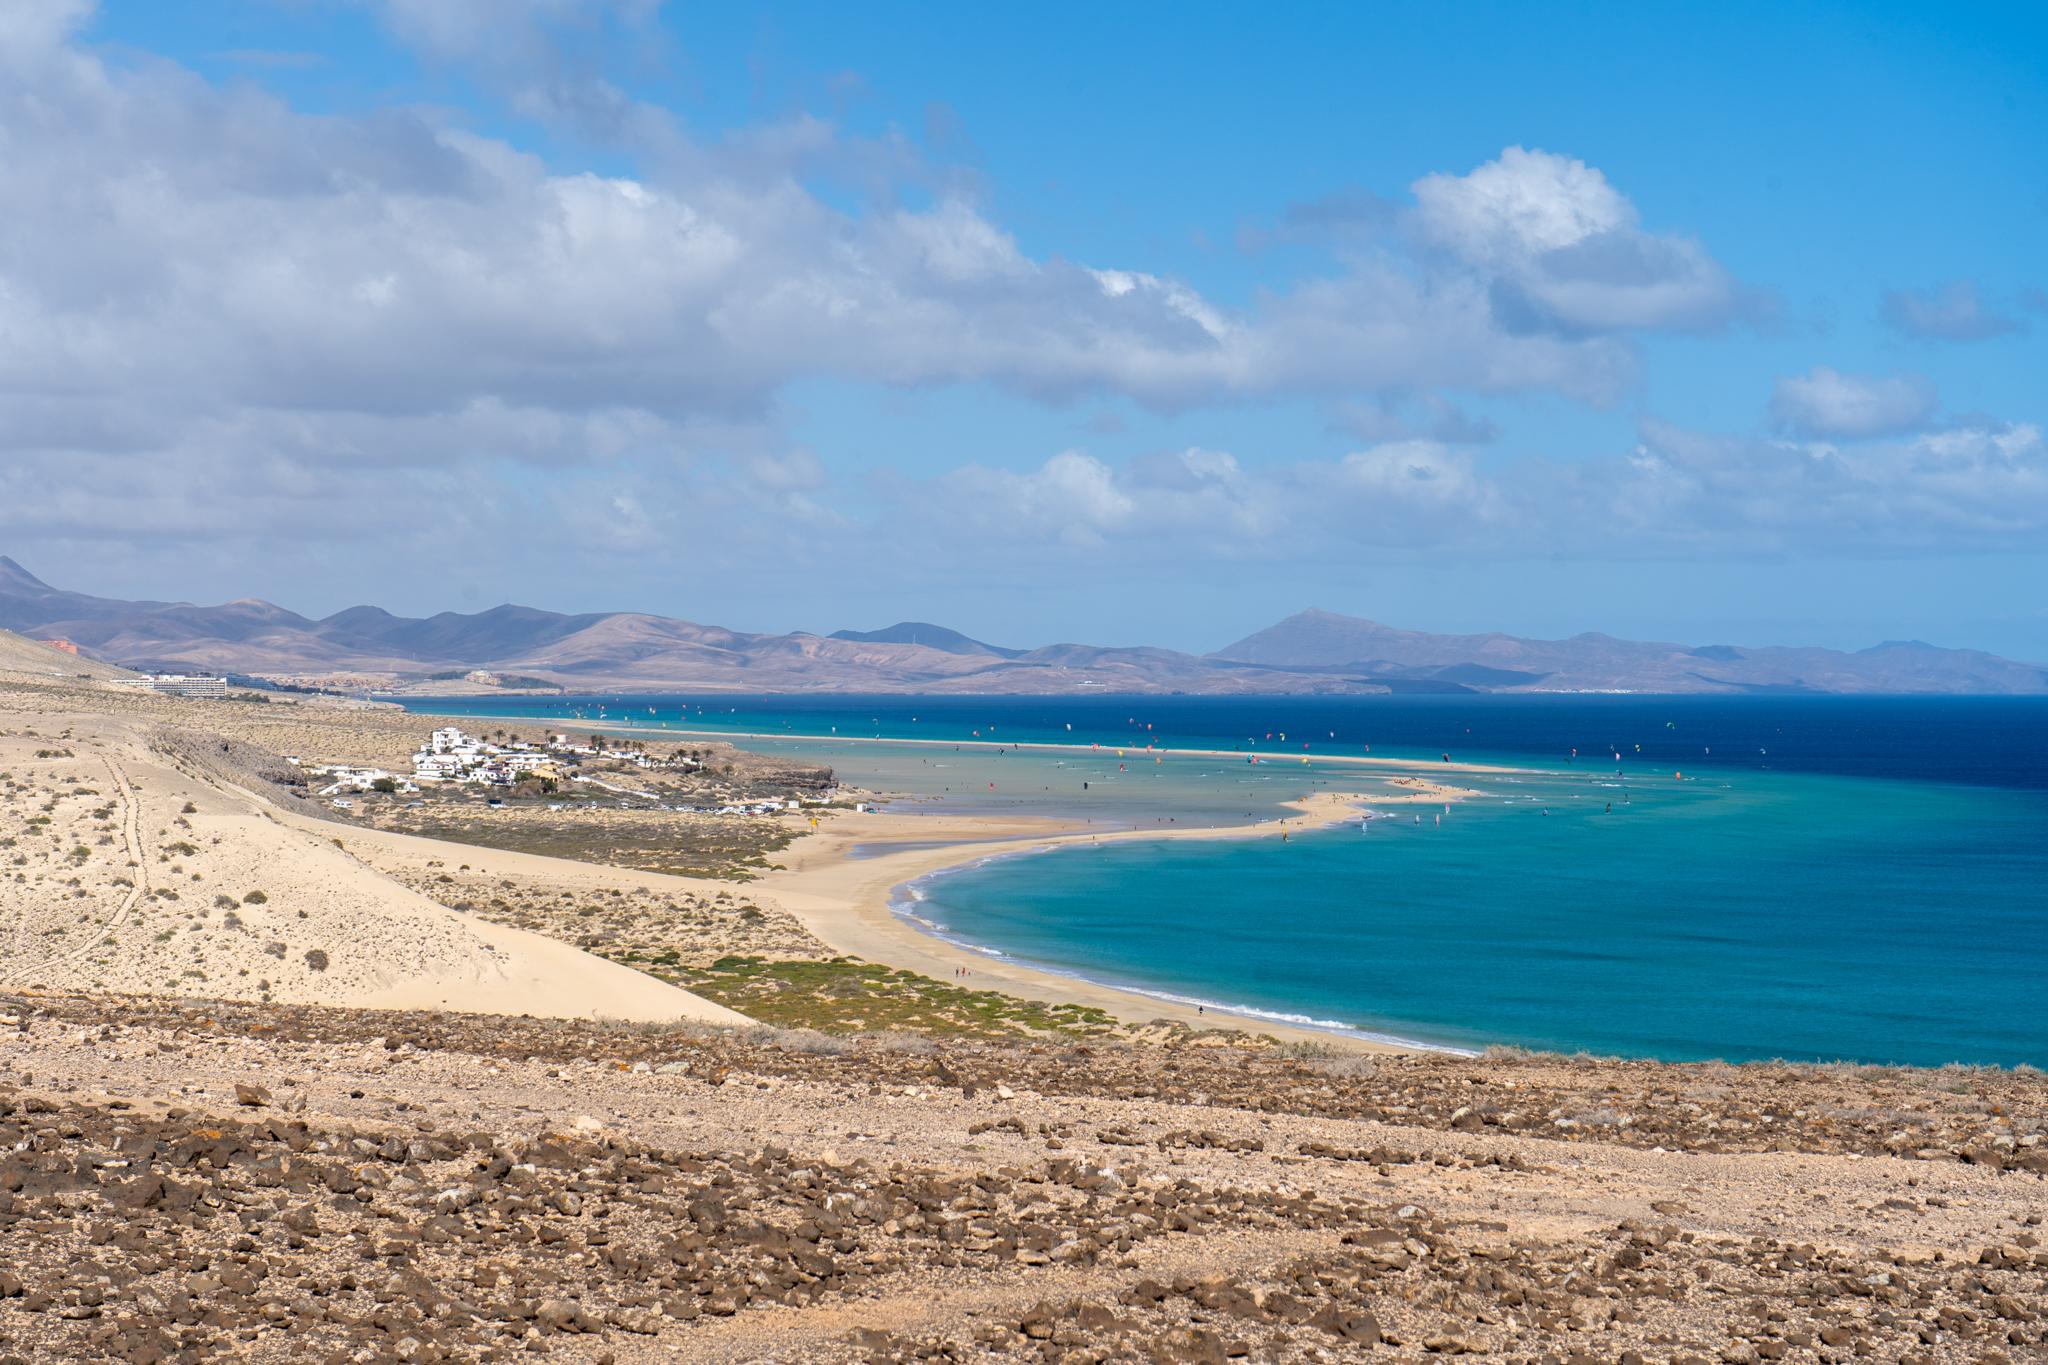 Playa Blanca auf Fuerteventura